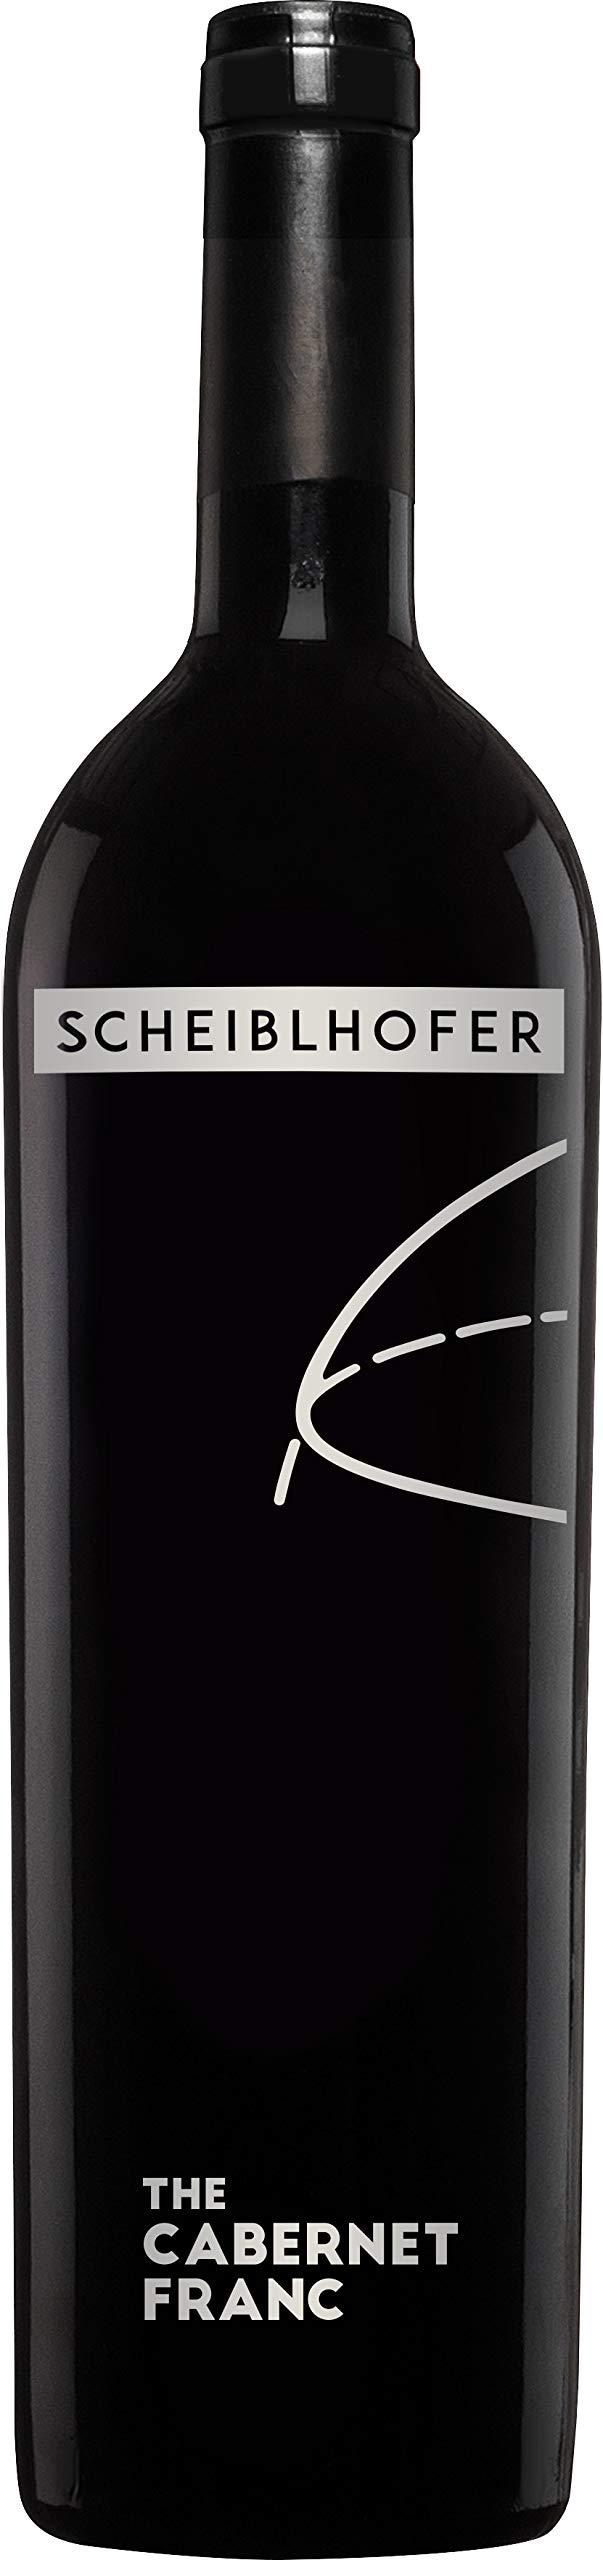 Erich-Scheiblhofer-The-Cabernet-Franc-2017